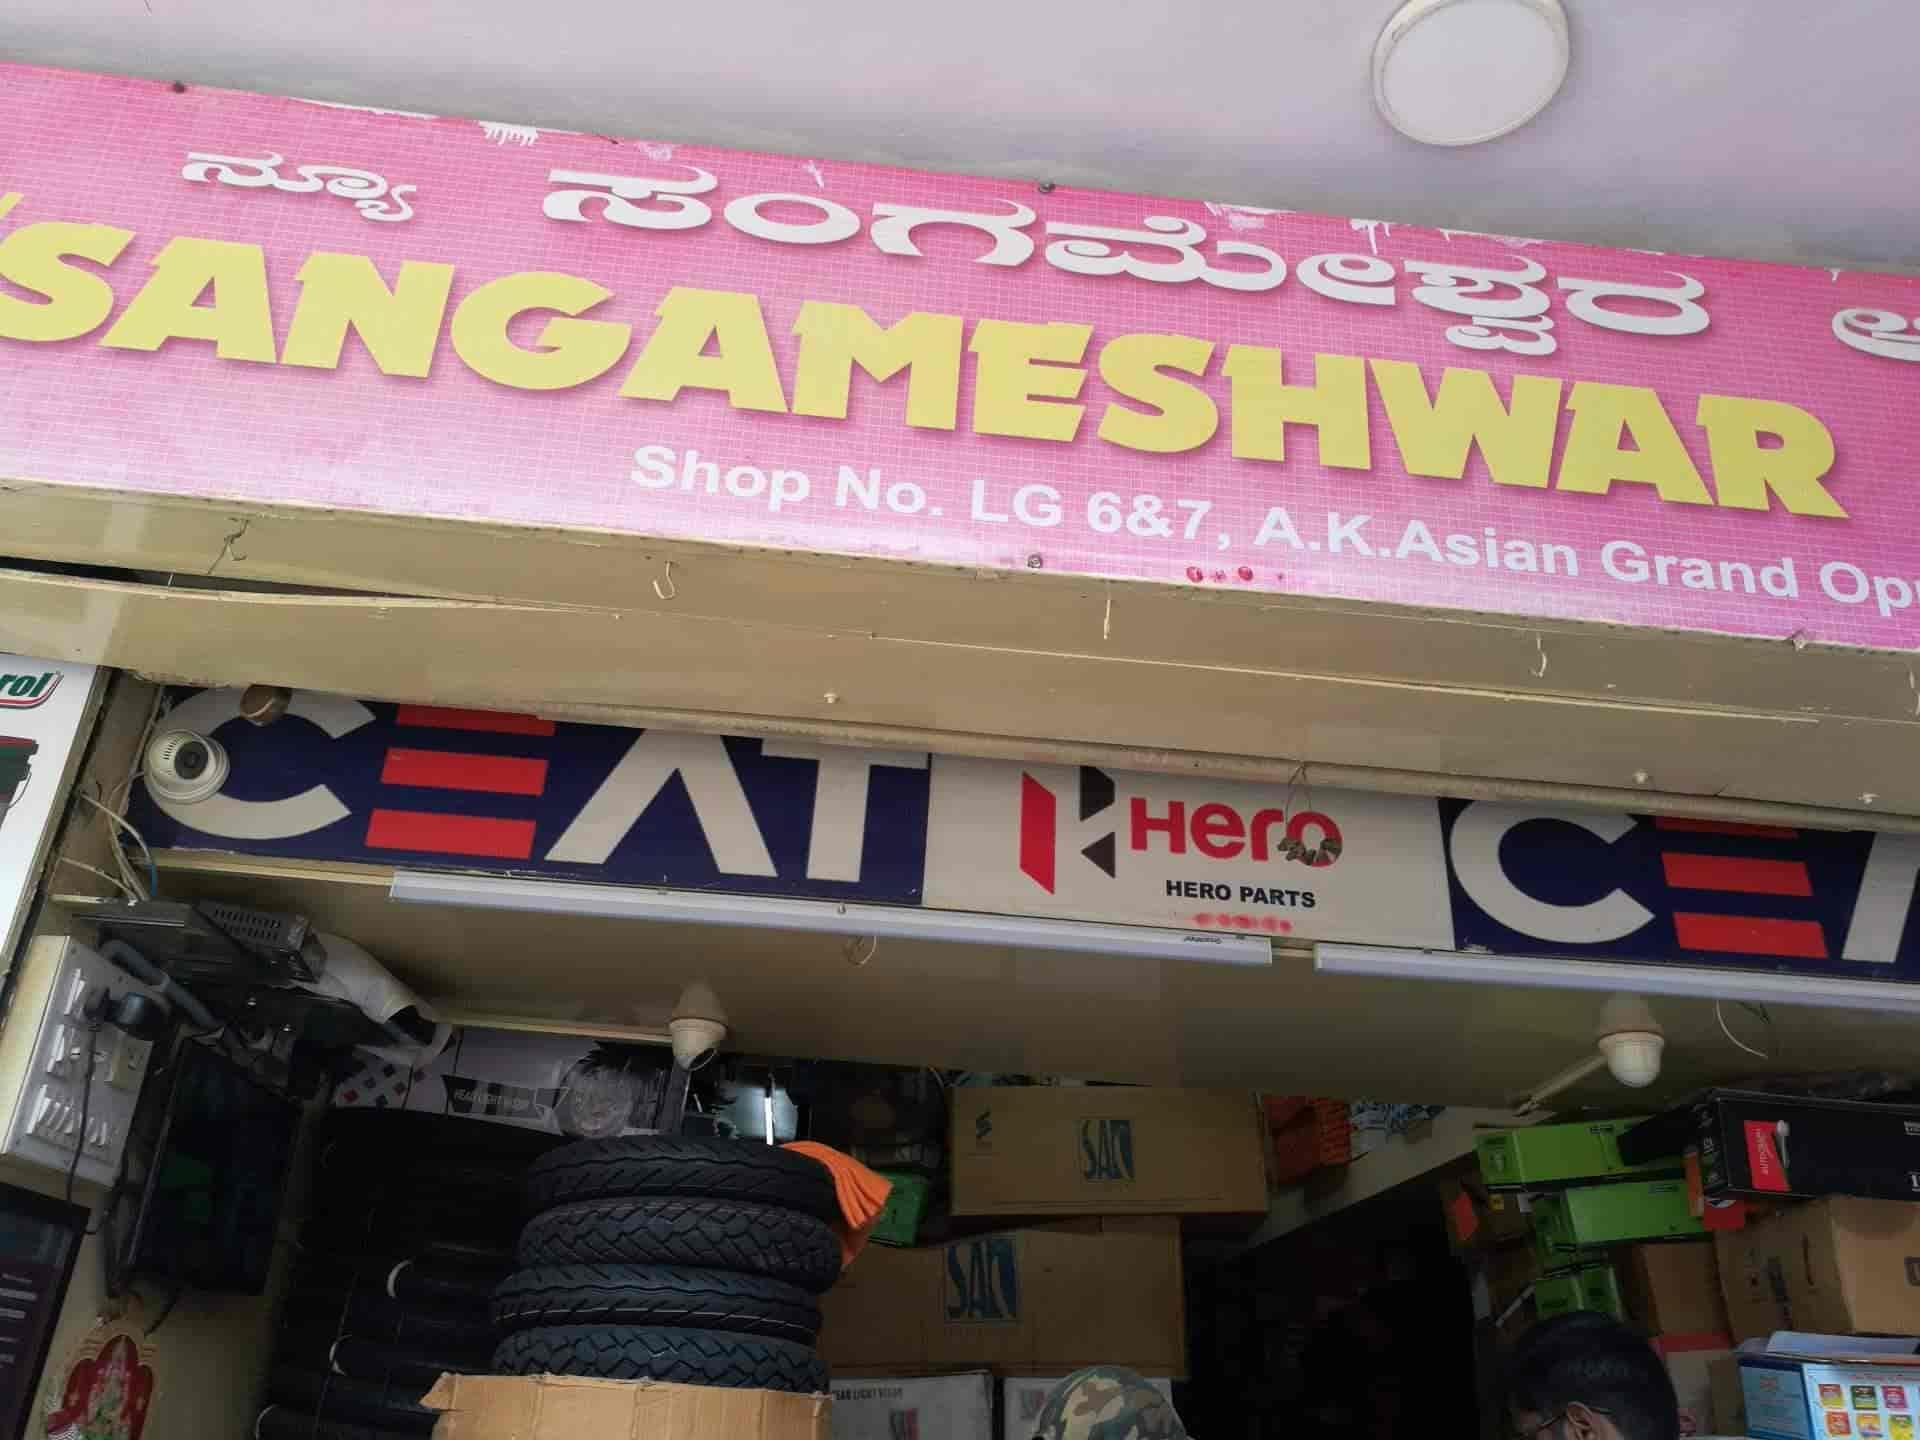 New Sangameshwar Auto Traders, Station Road Gulbarga - Tyre